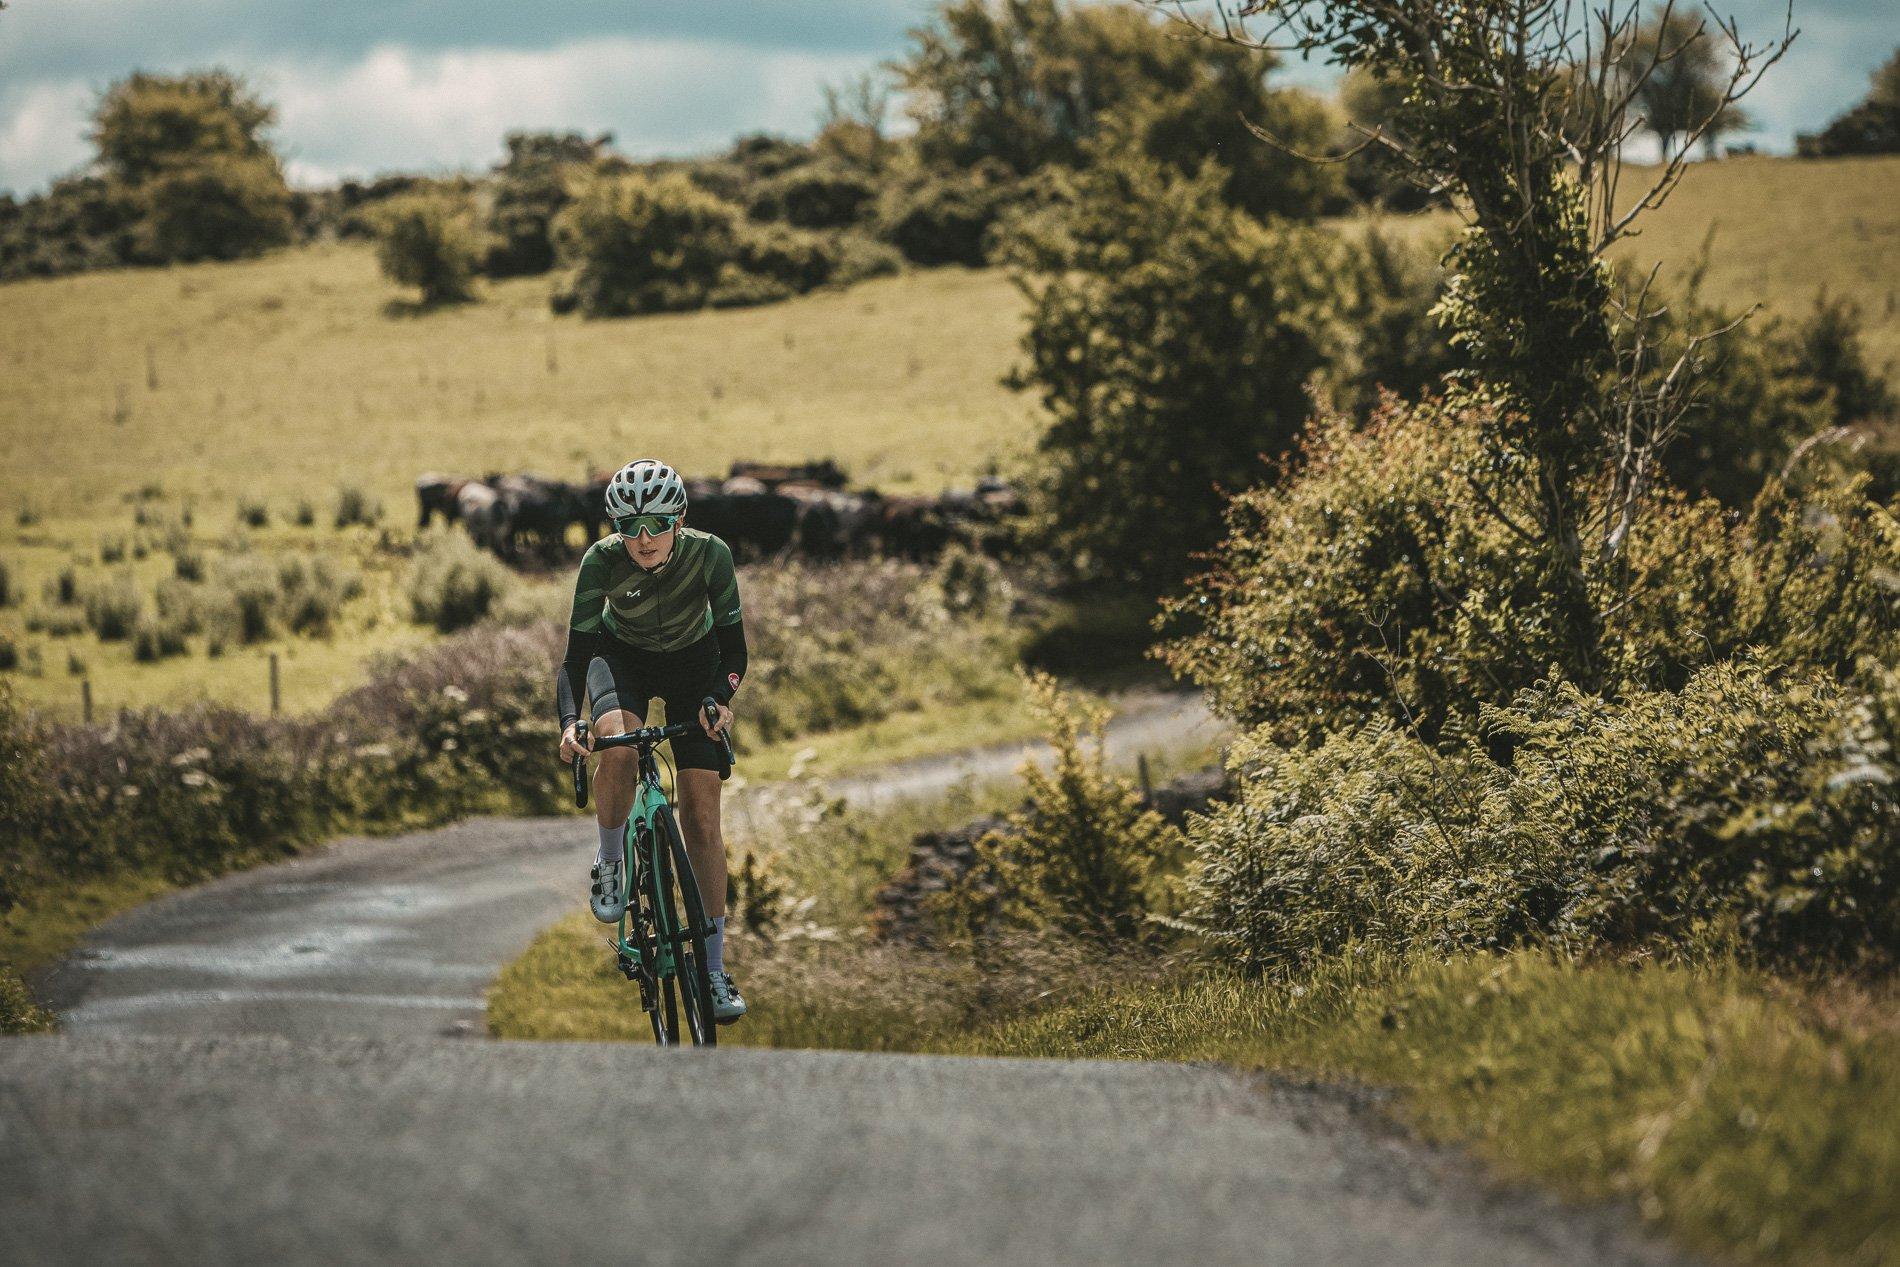 Female cyclist riding towards camera